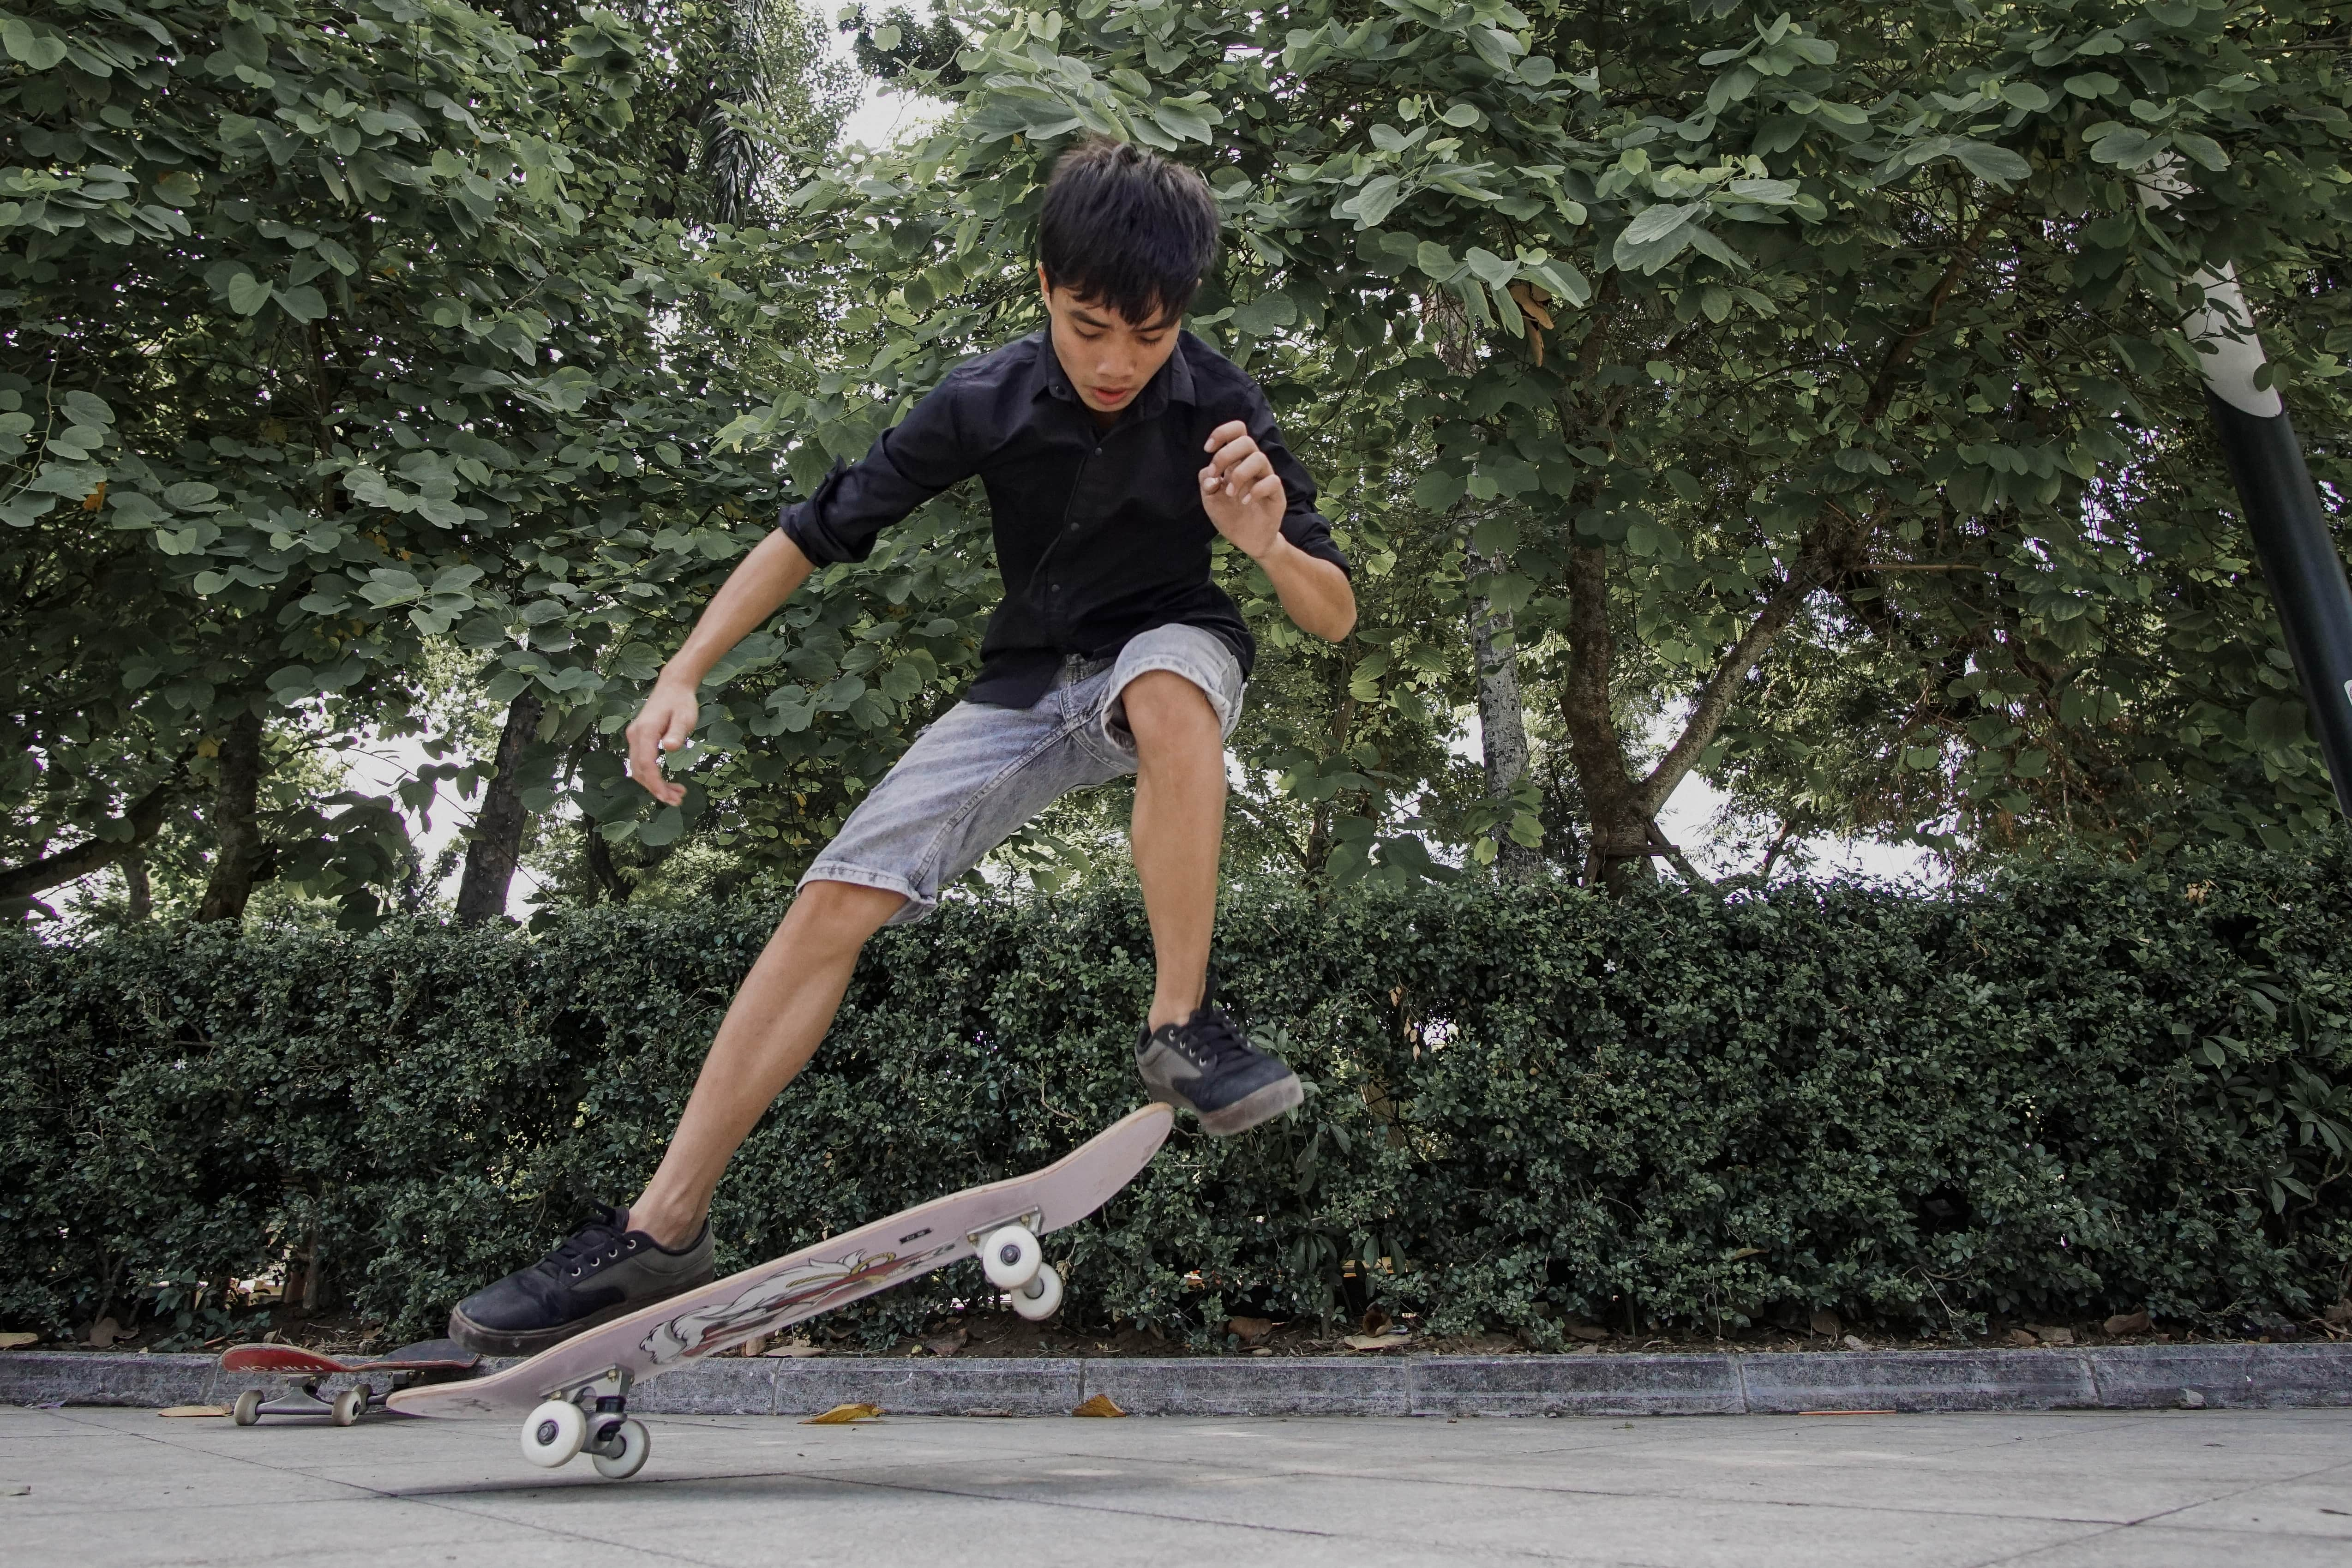 Blue Dragon-A child practicing skateboarding